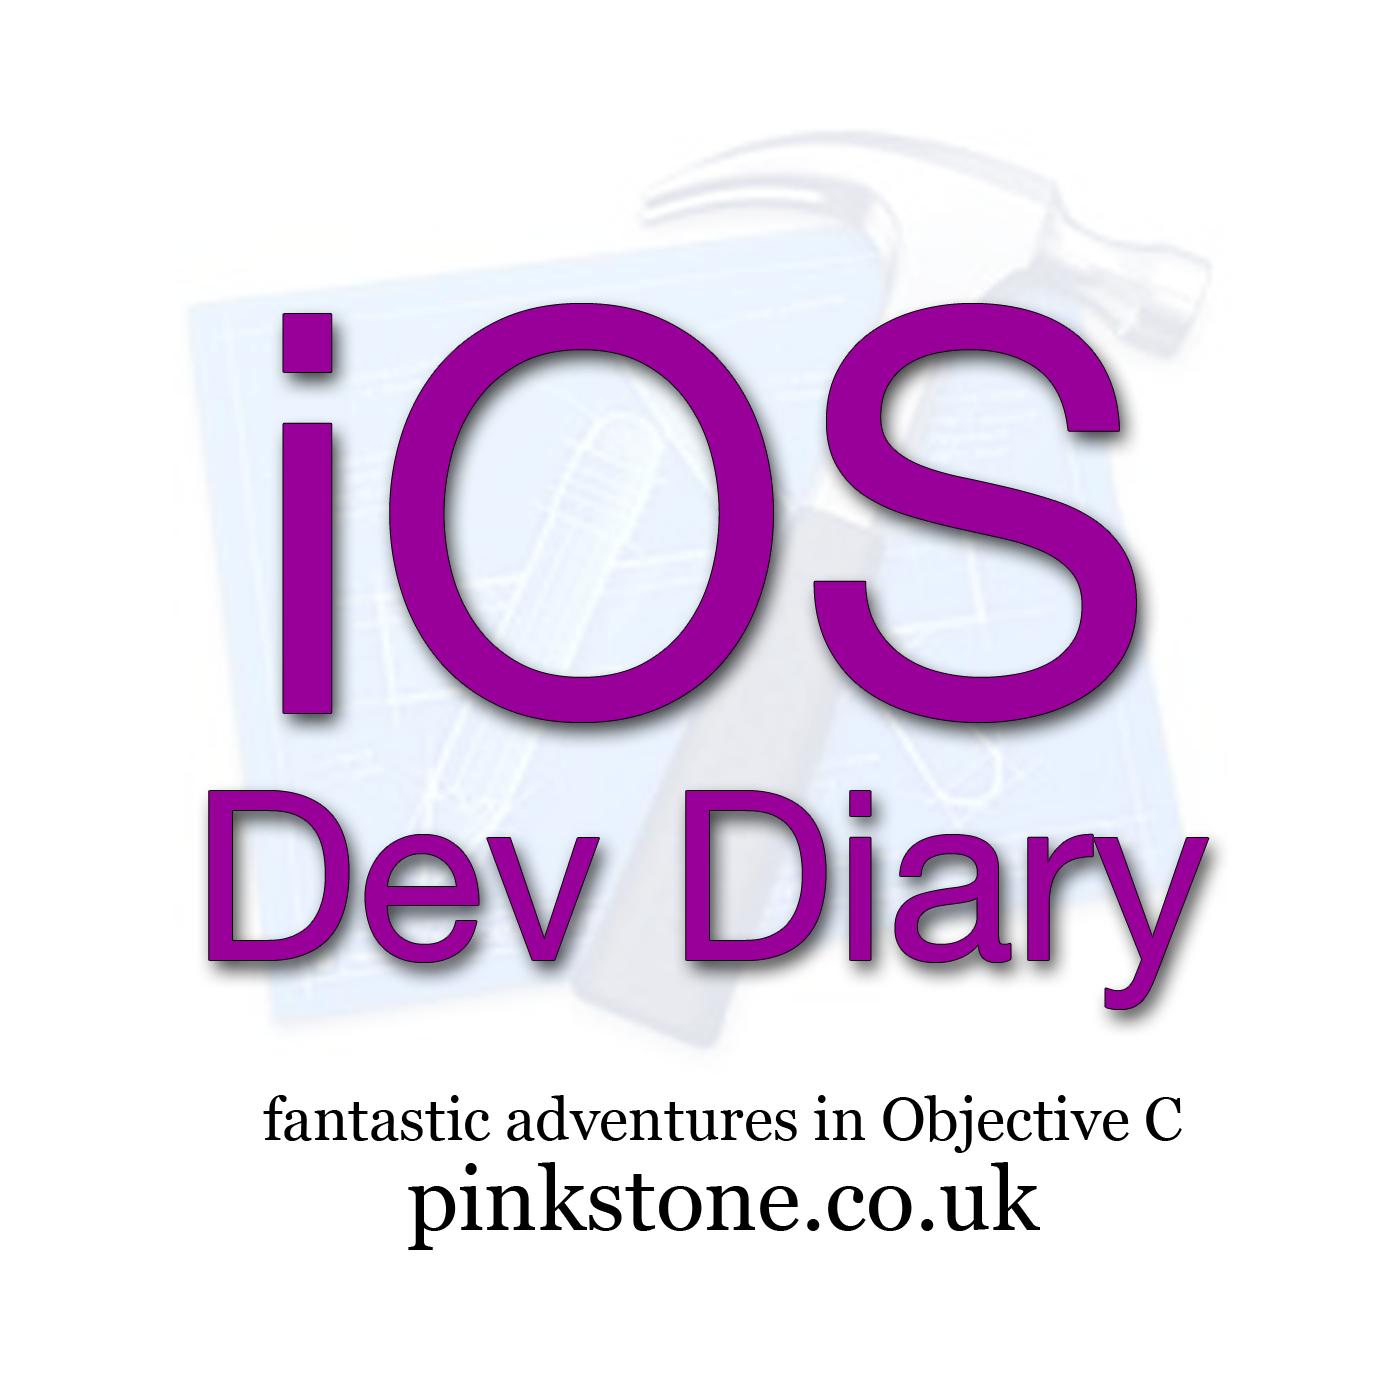 The iOS Dev Diary